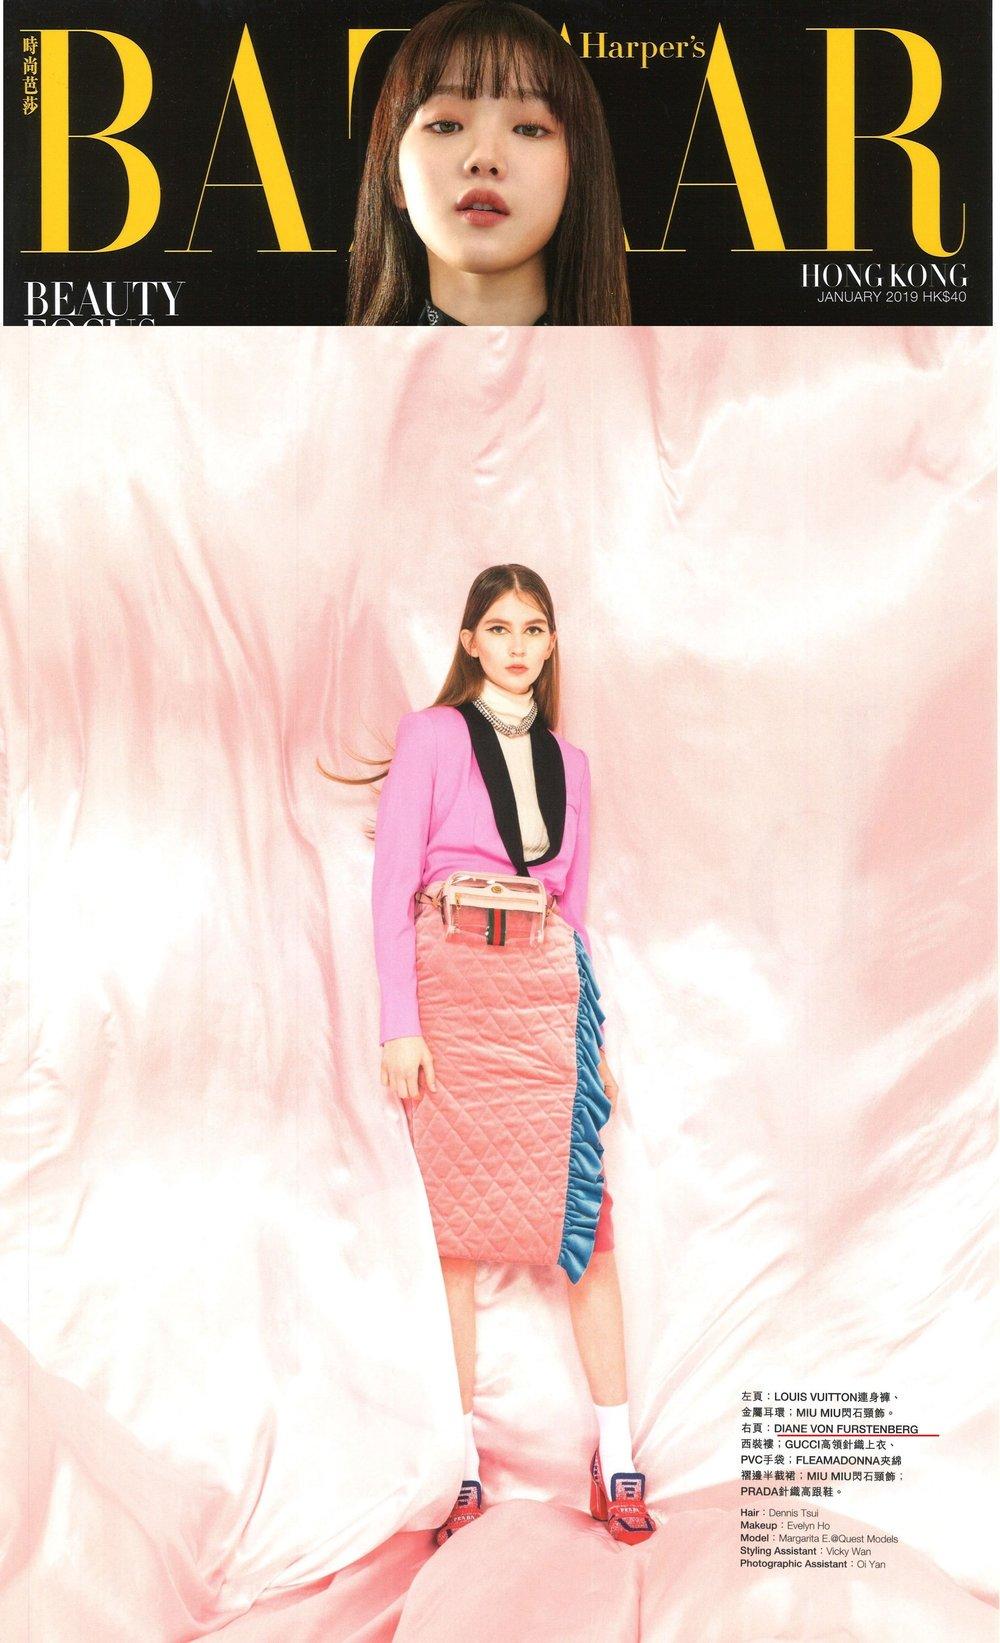 Harper's Bazaar_Jan 19 DVF 1.jpg